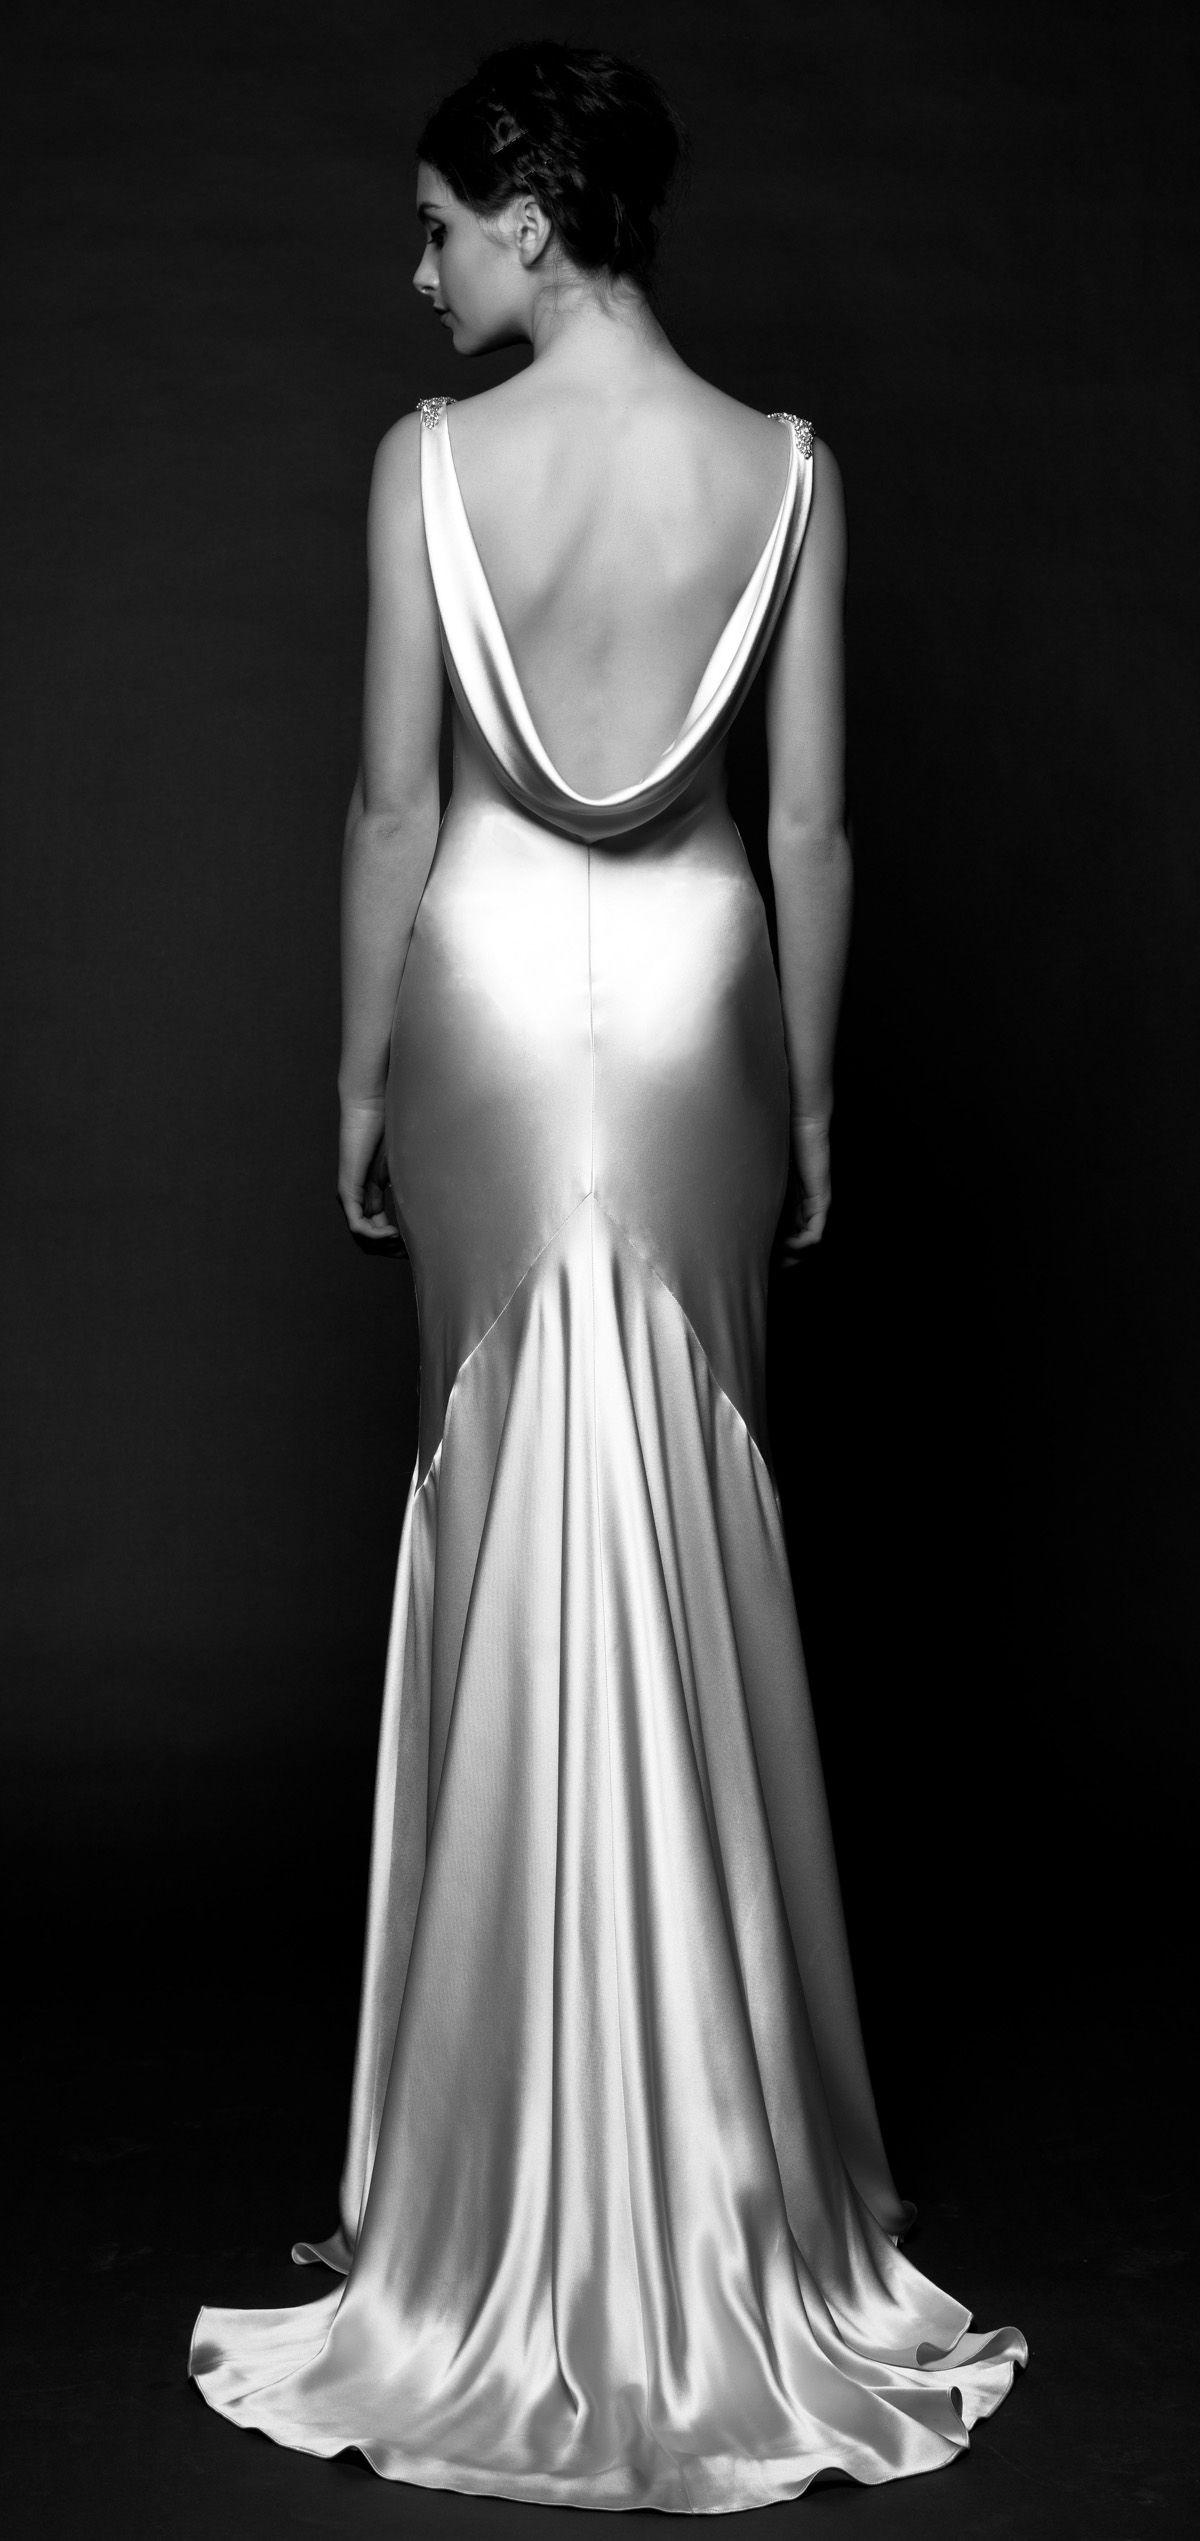 Sarah Janks Wedding Dresses Fall 2014 | Ready to Marry IV ...